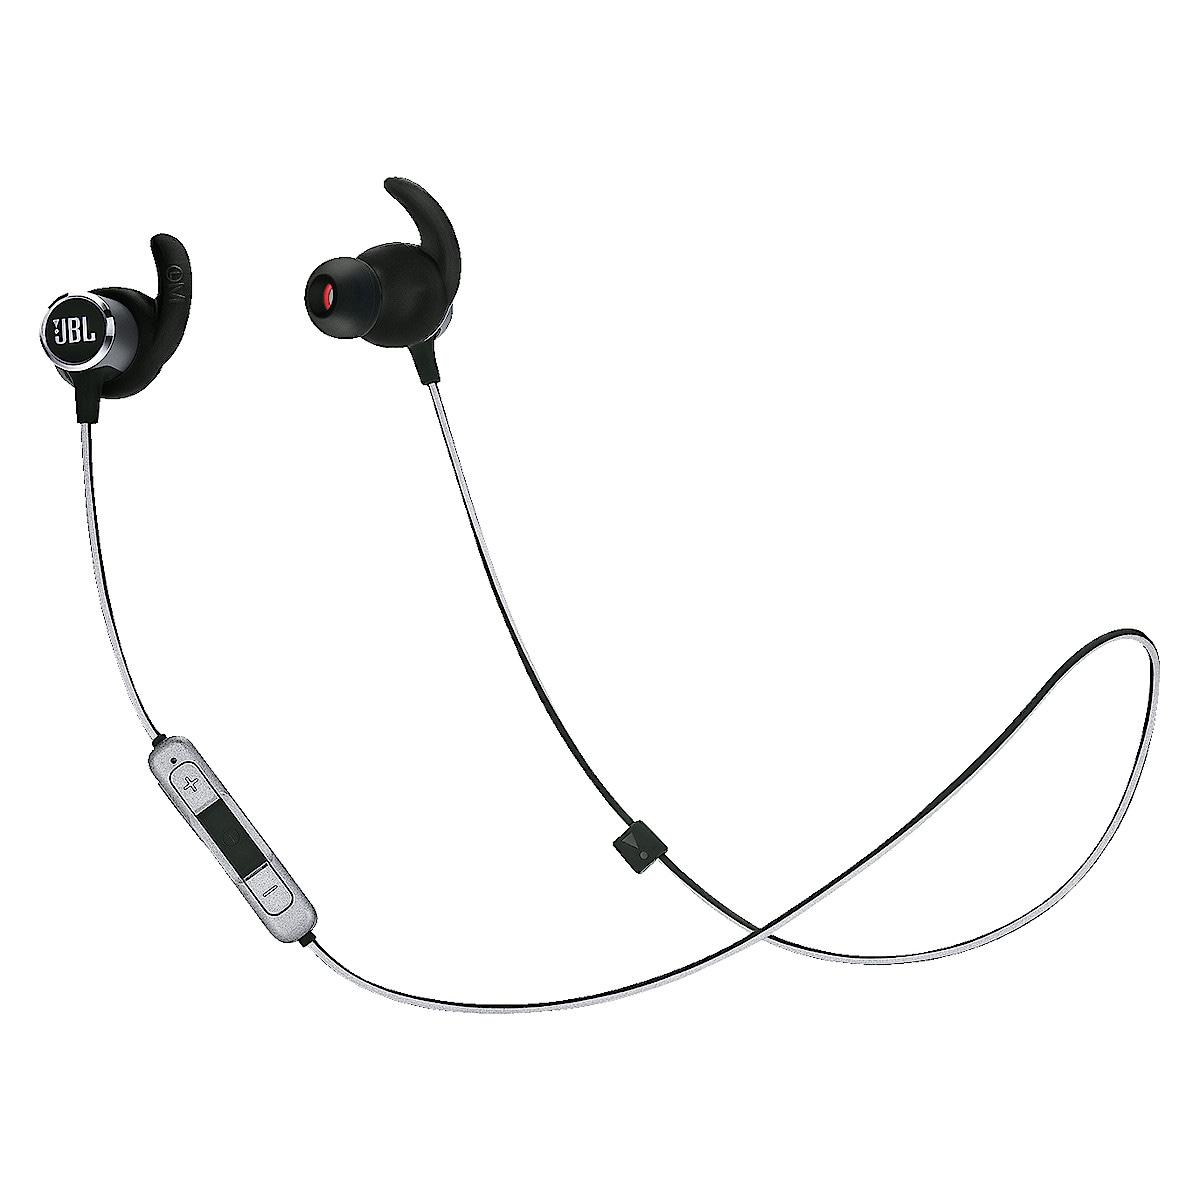 Trådlösa hörlurar med mikrofon JBL Reflect Mini 2